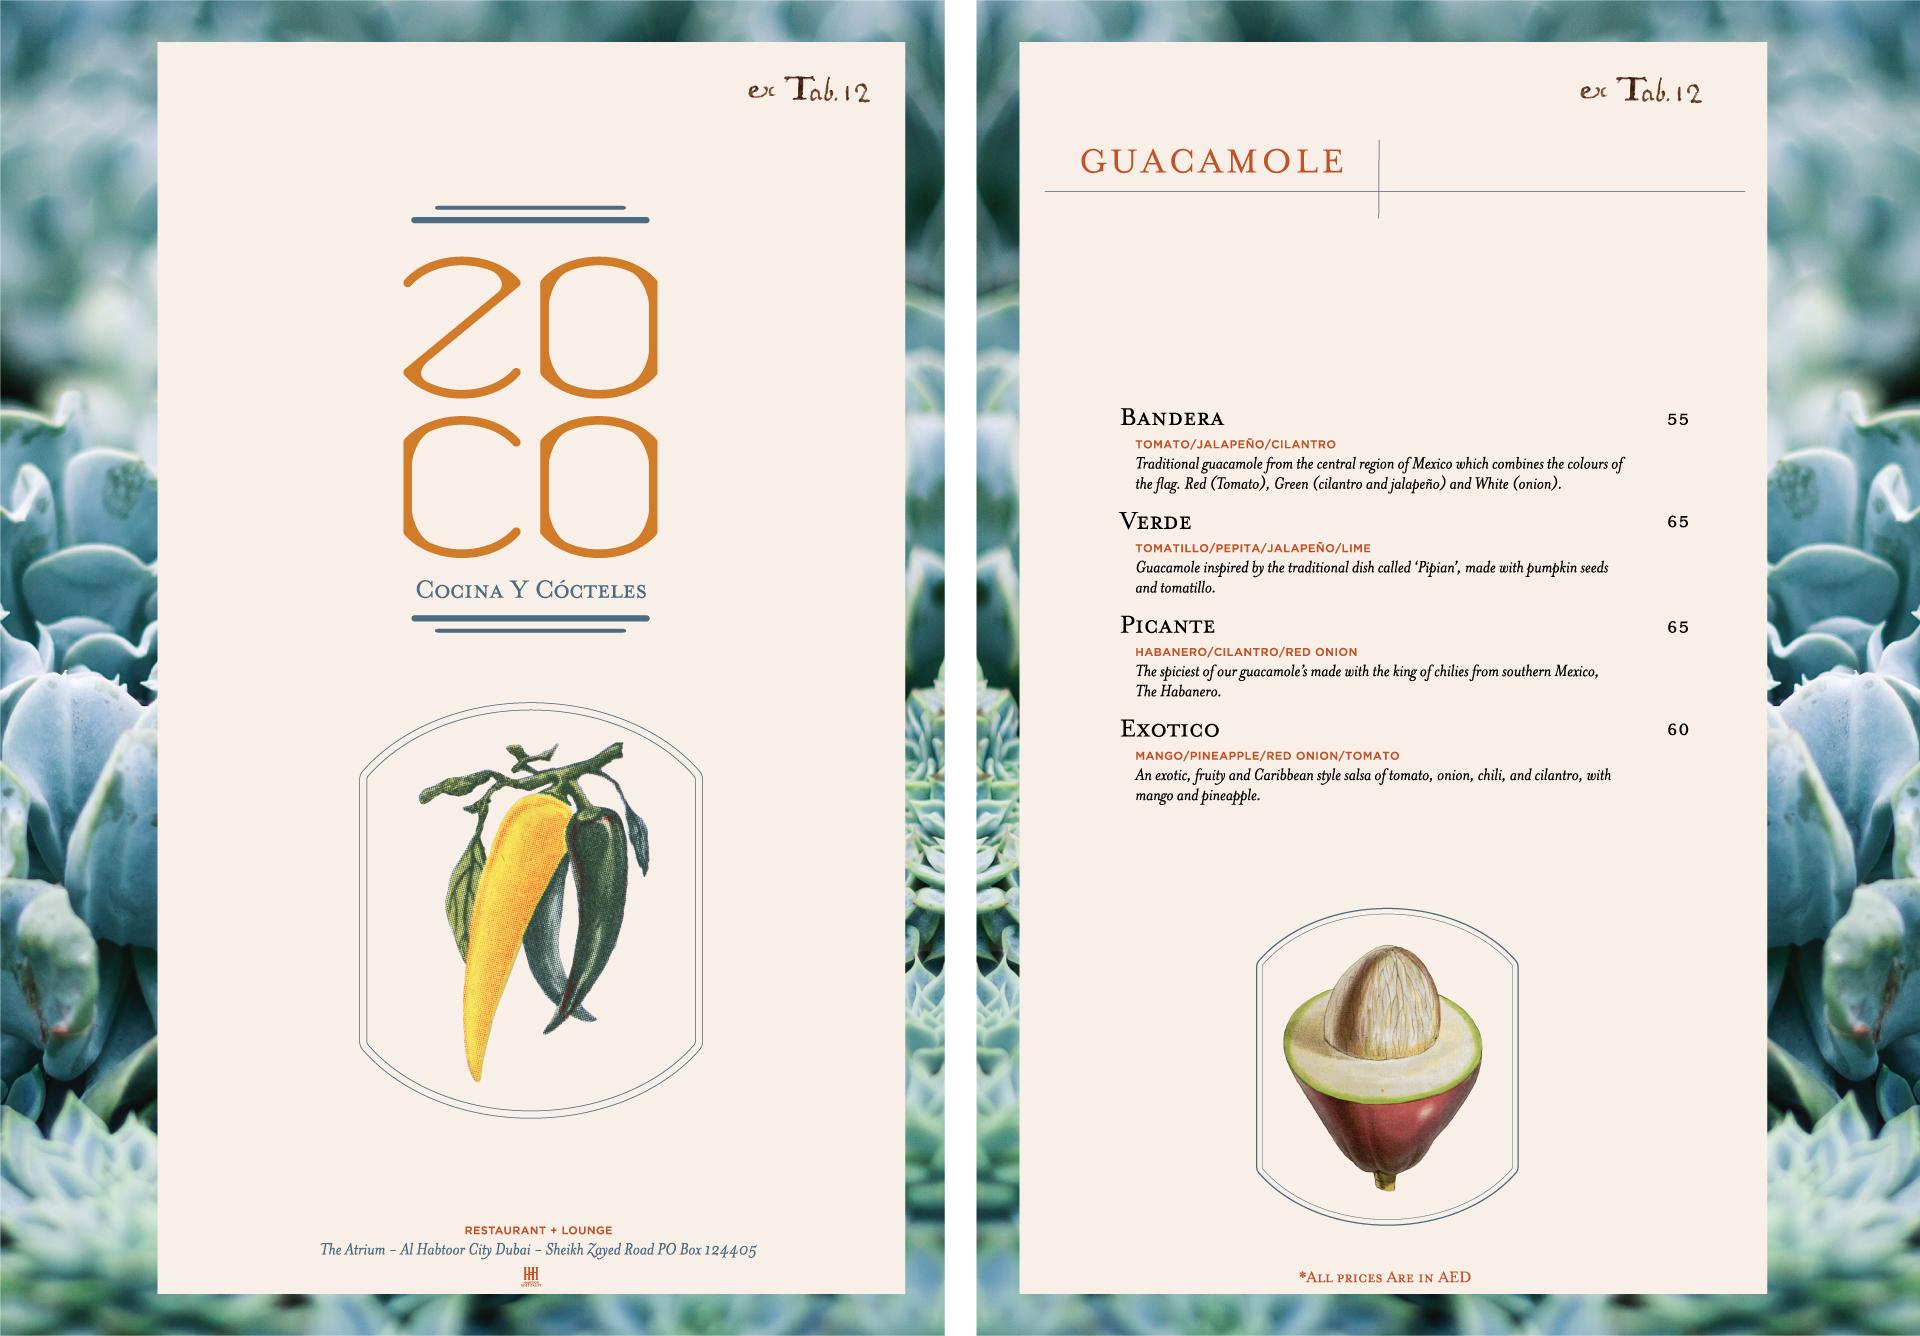 zoco_menu1